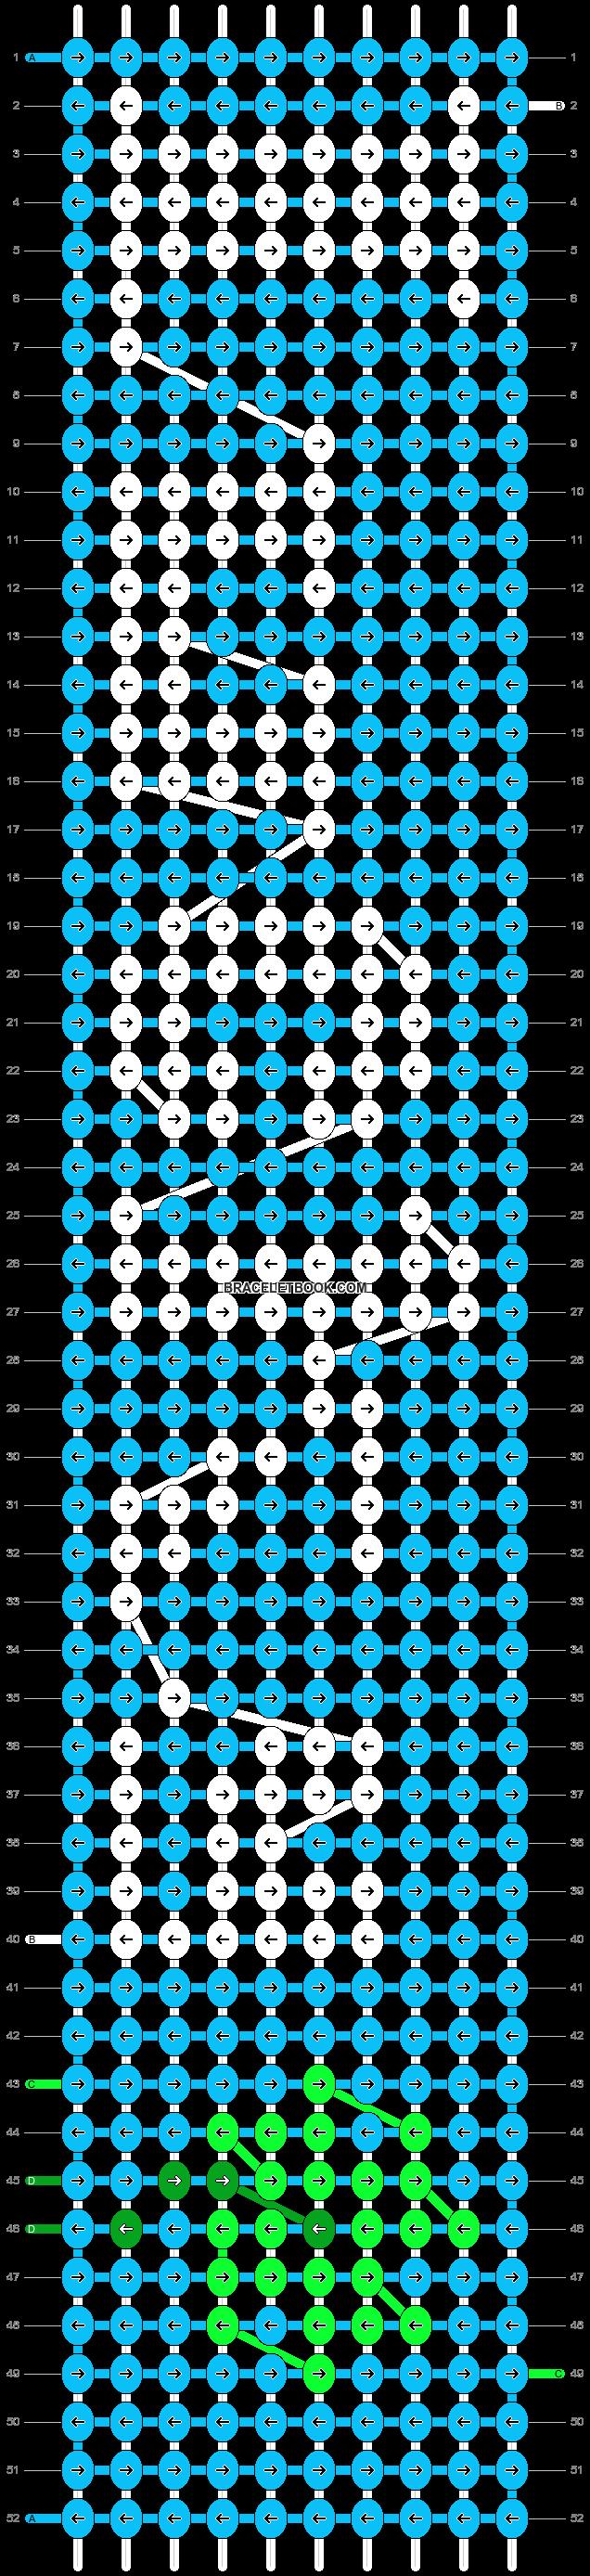 Alpha pattern #3024 pattern